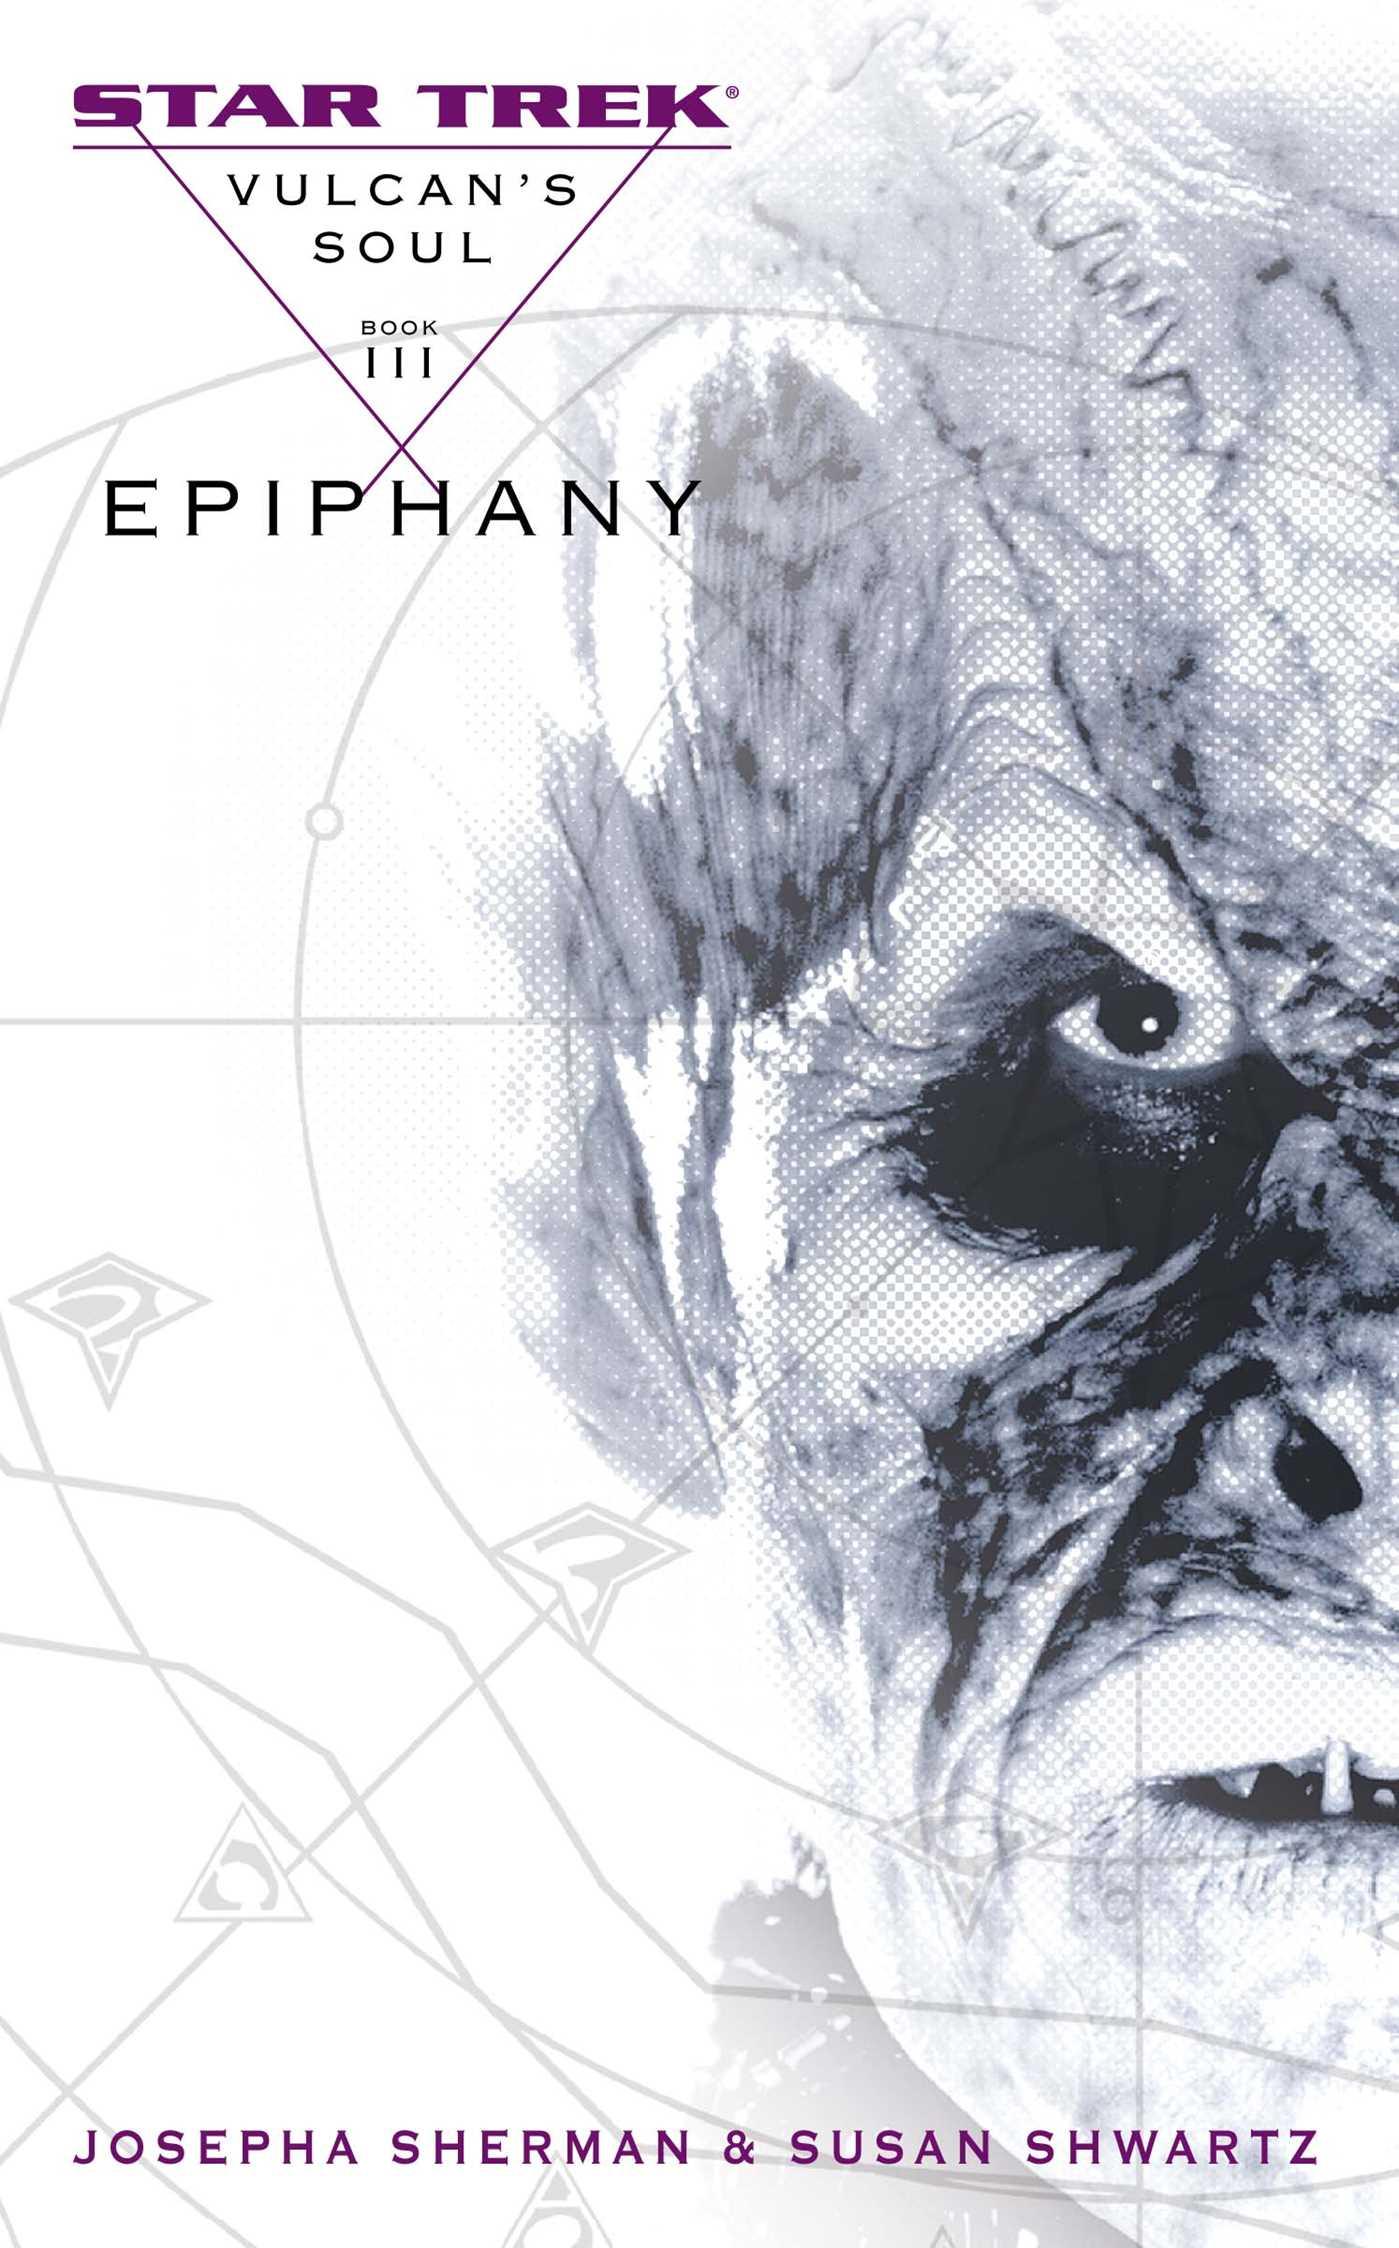 Star trek the original series vulcans soul 3 epiphany 9781501142901 hr